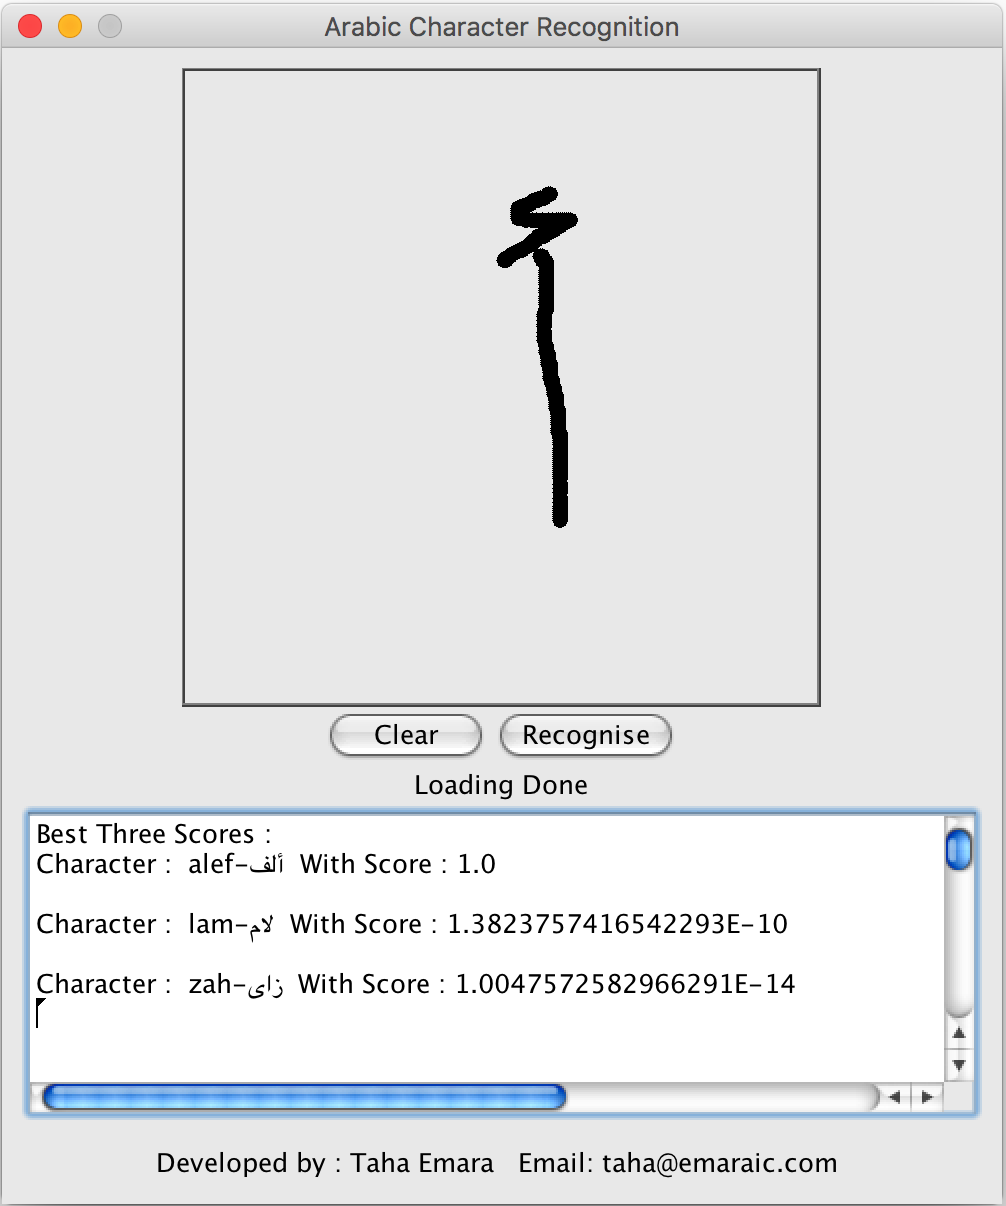 Emaraic - Arabic Handwritten Characters Recognition using